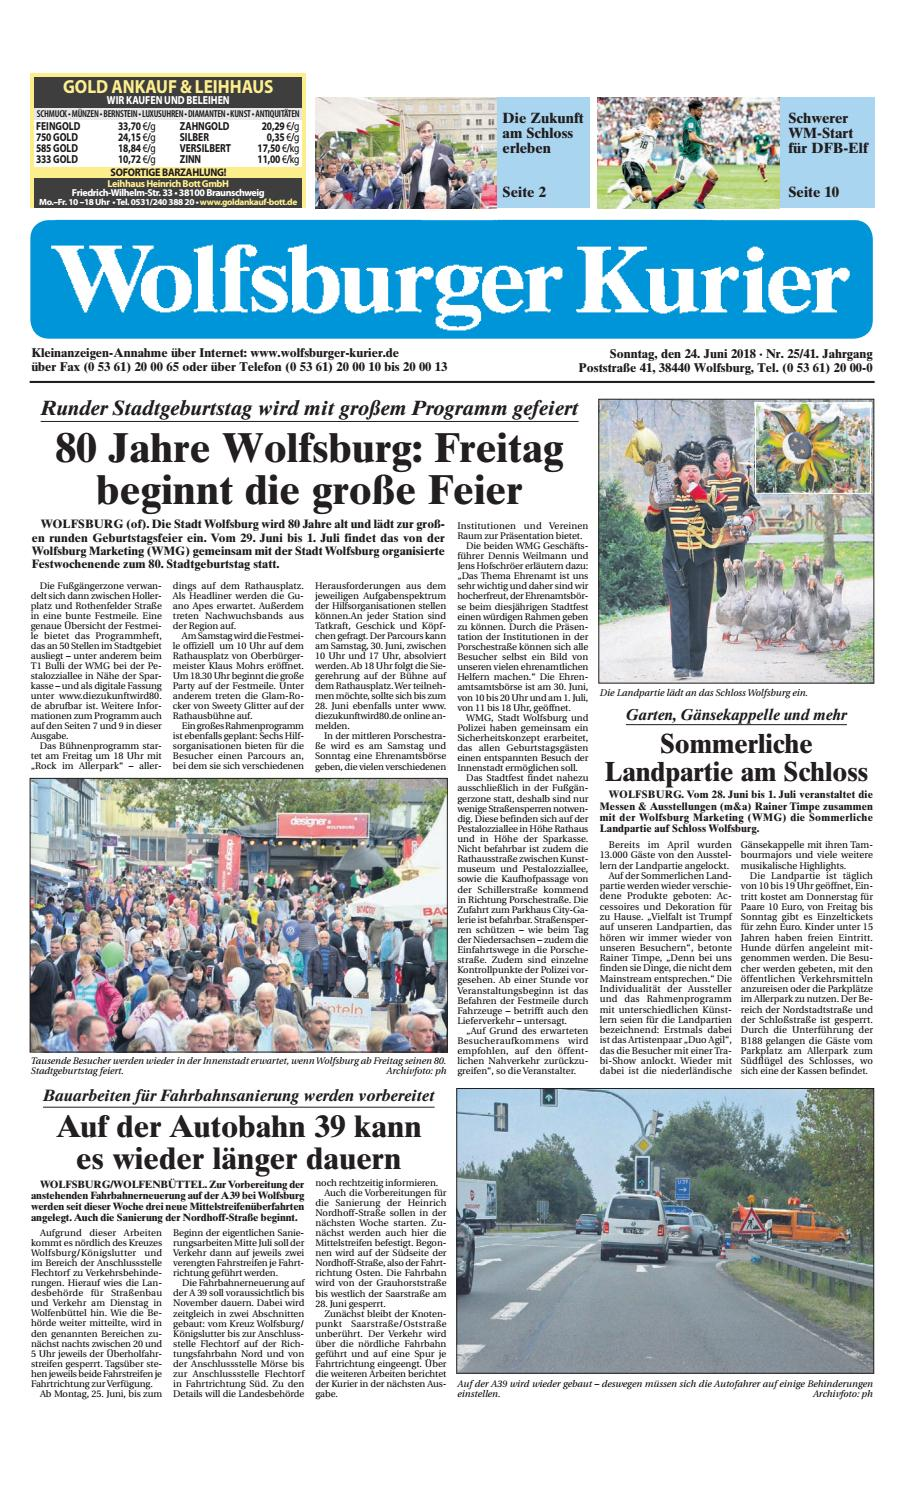 2018 06 24 by Wolfsburger Kurier - issuu